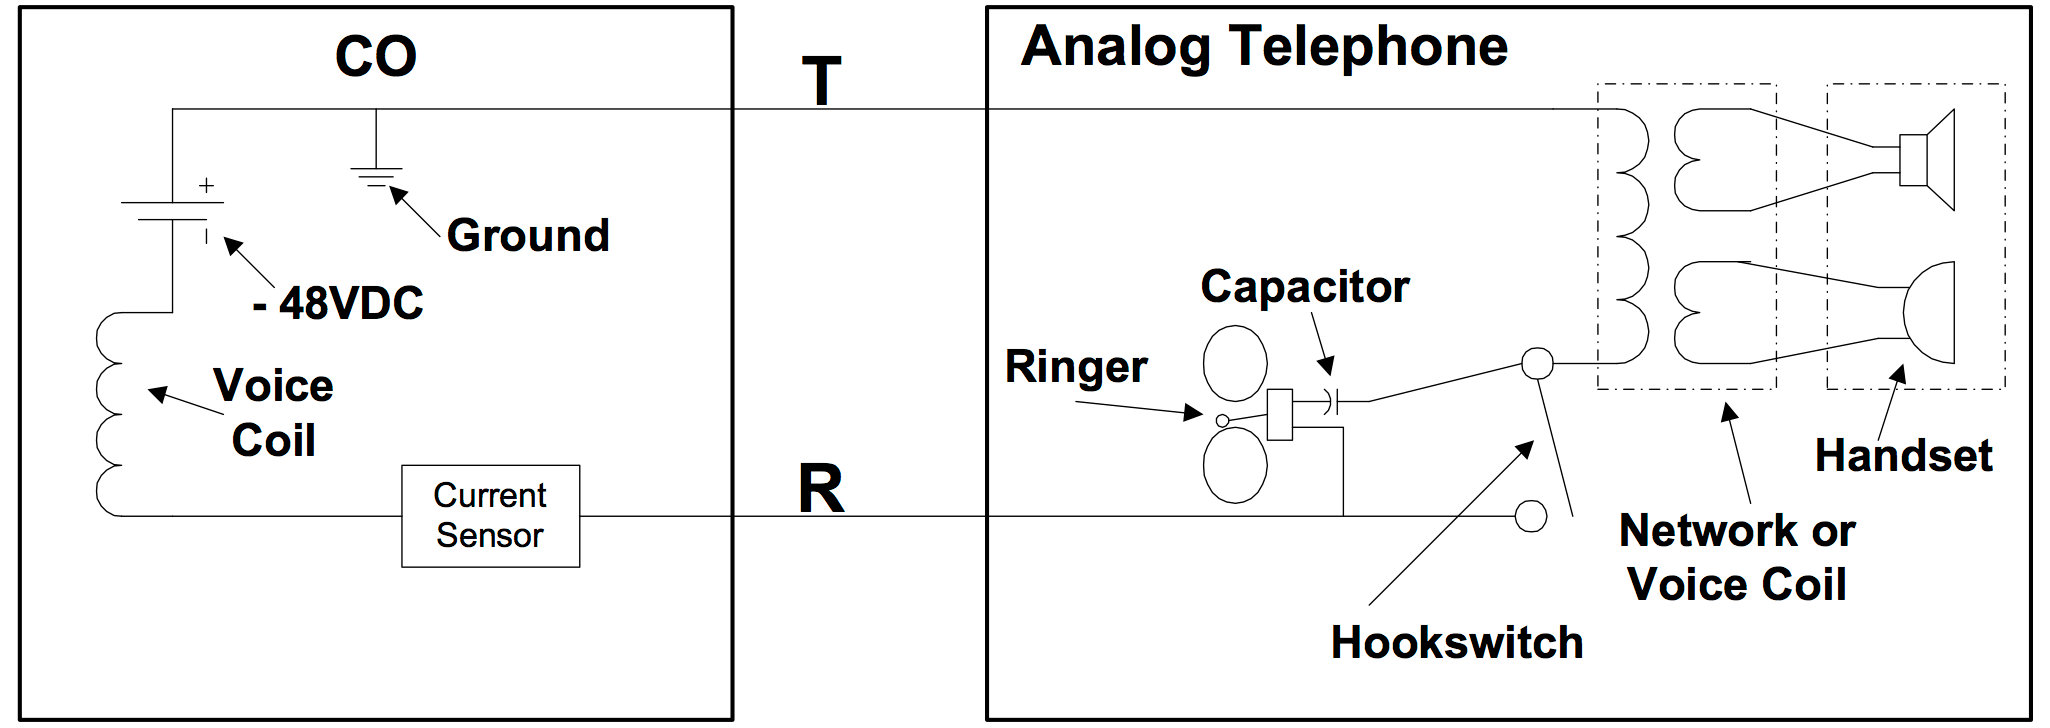 Telephone Wiring Diagram Handset